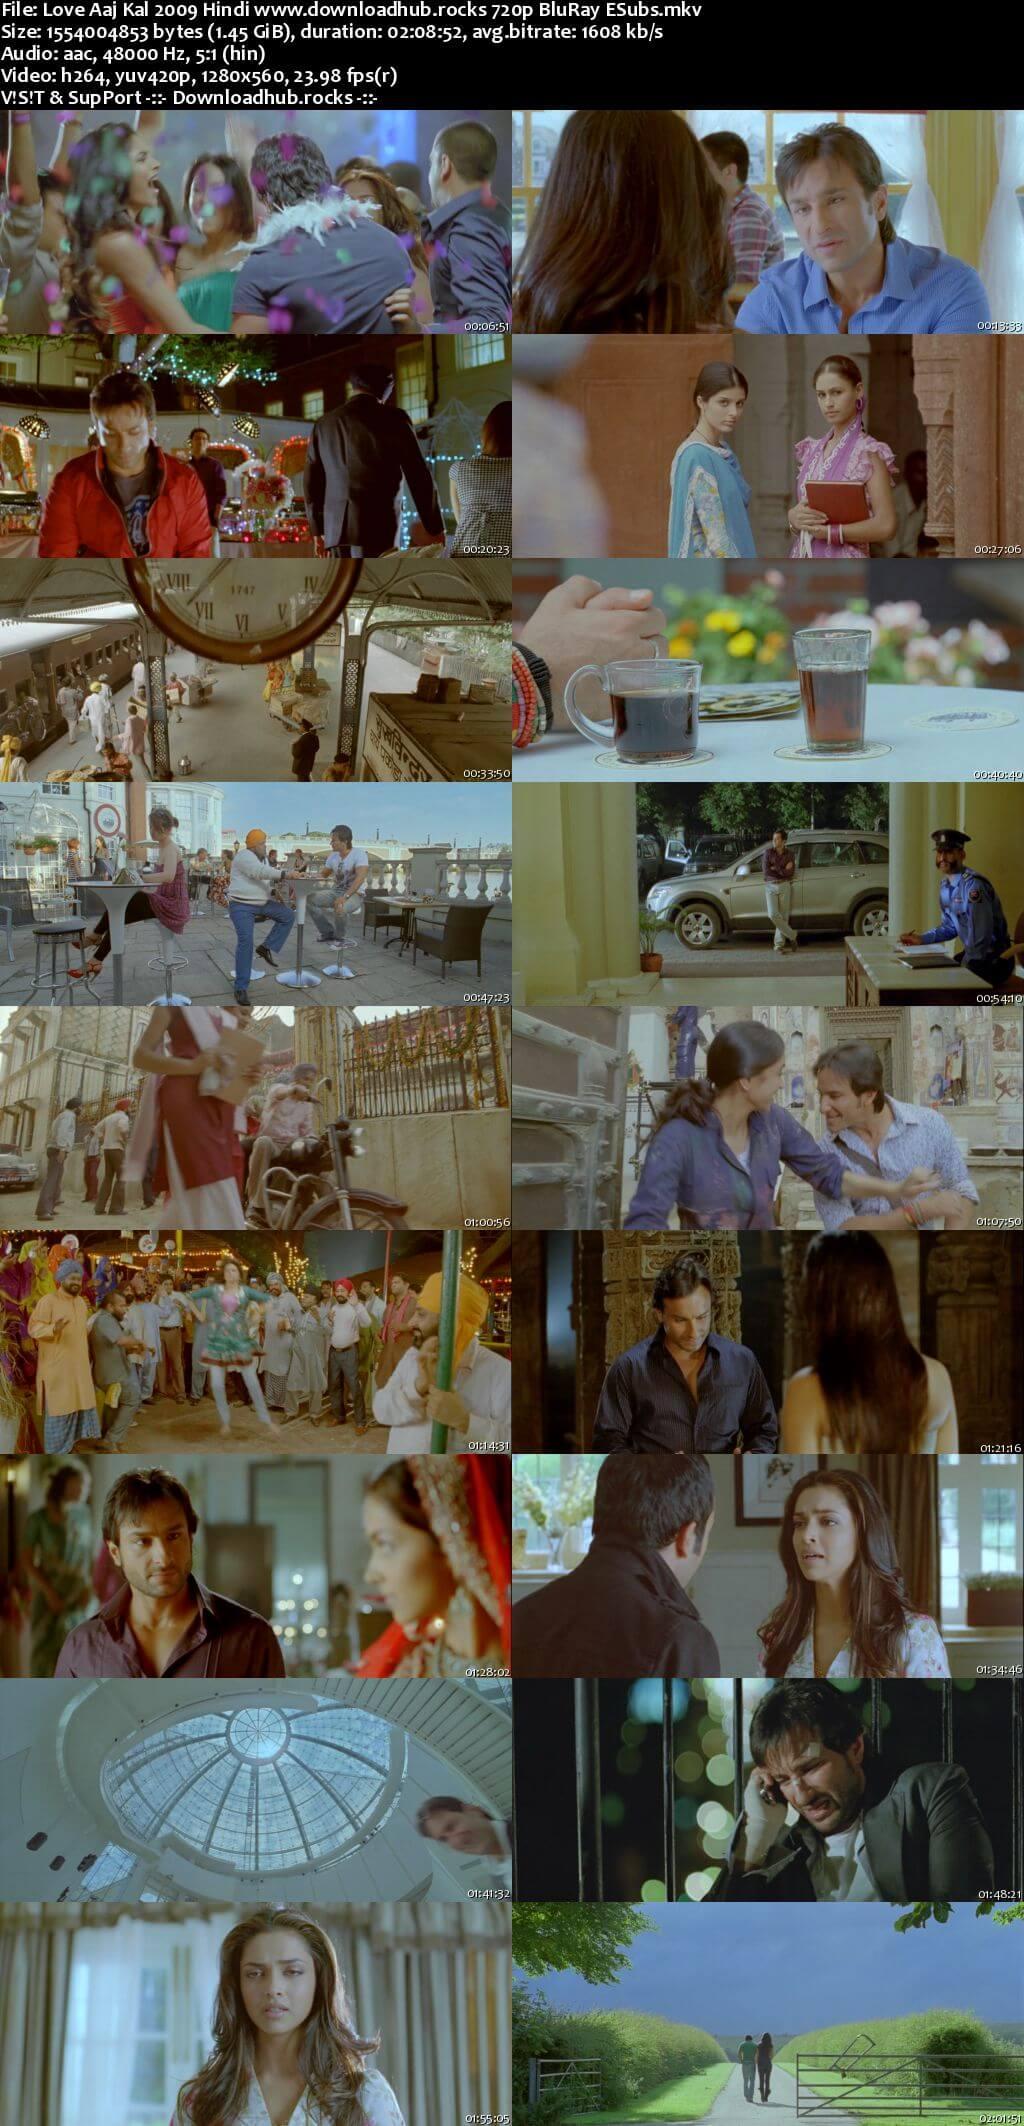 Love Aaj Kal 2009 Hindi 720p BluRay ESubs